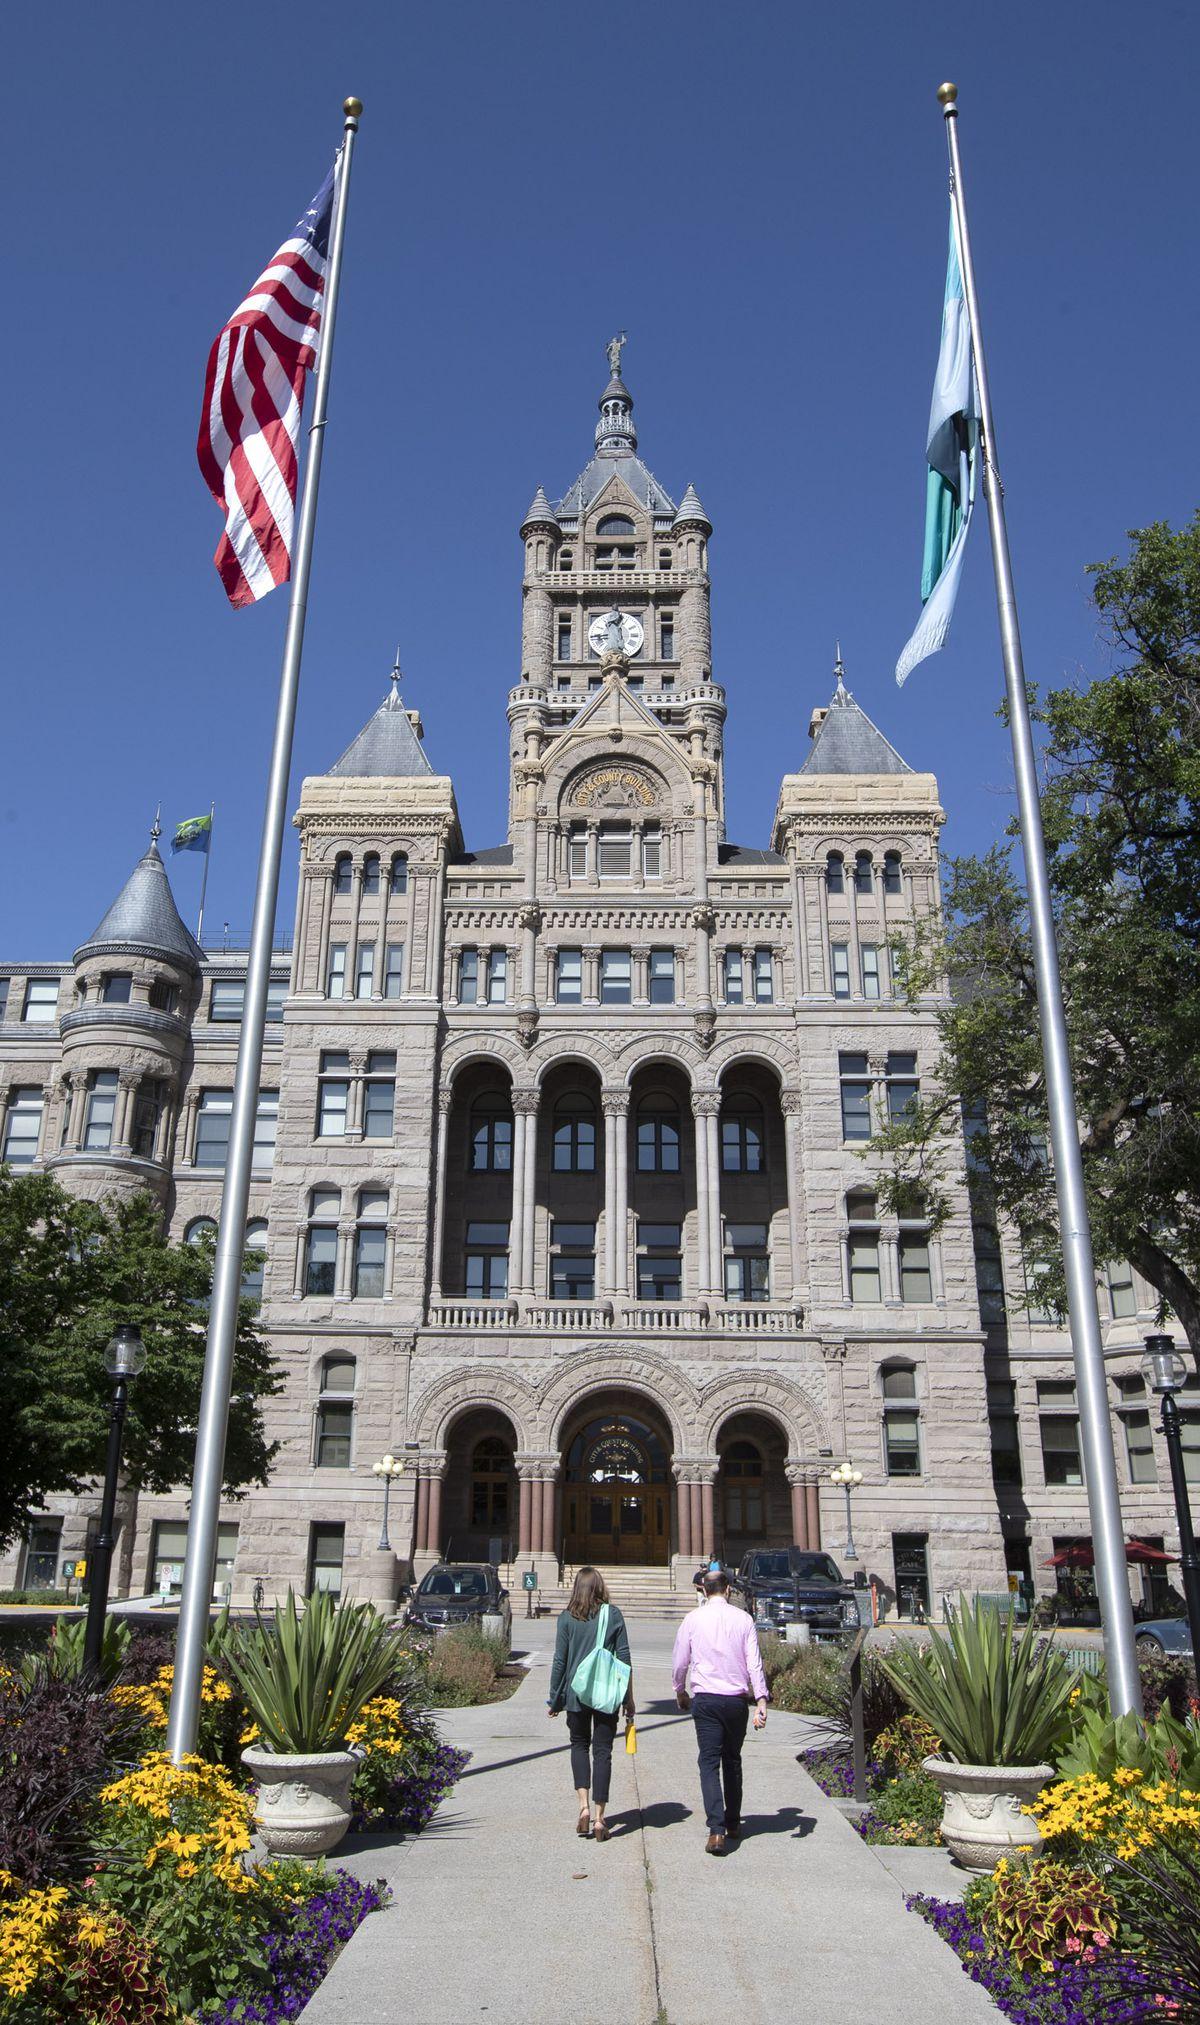 The Salt Lake City and County Building on Monday, Aug. 12, 2019.